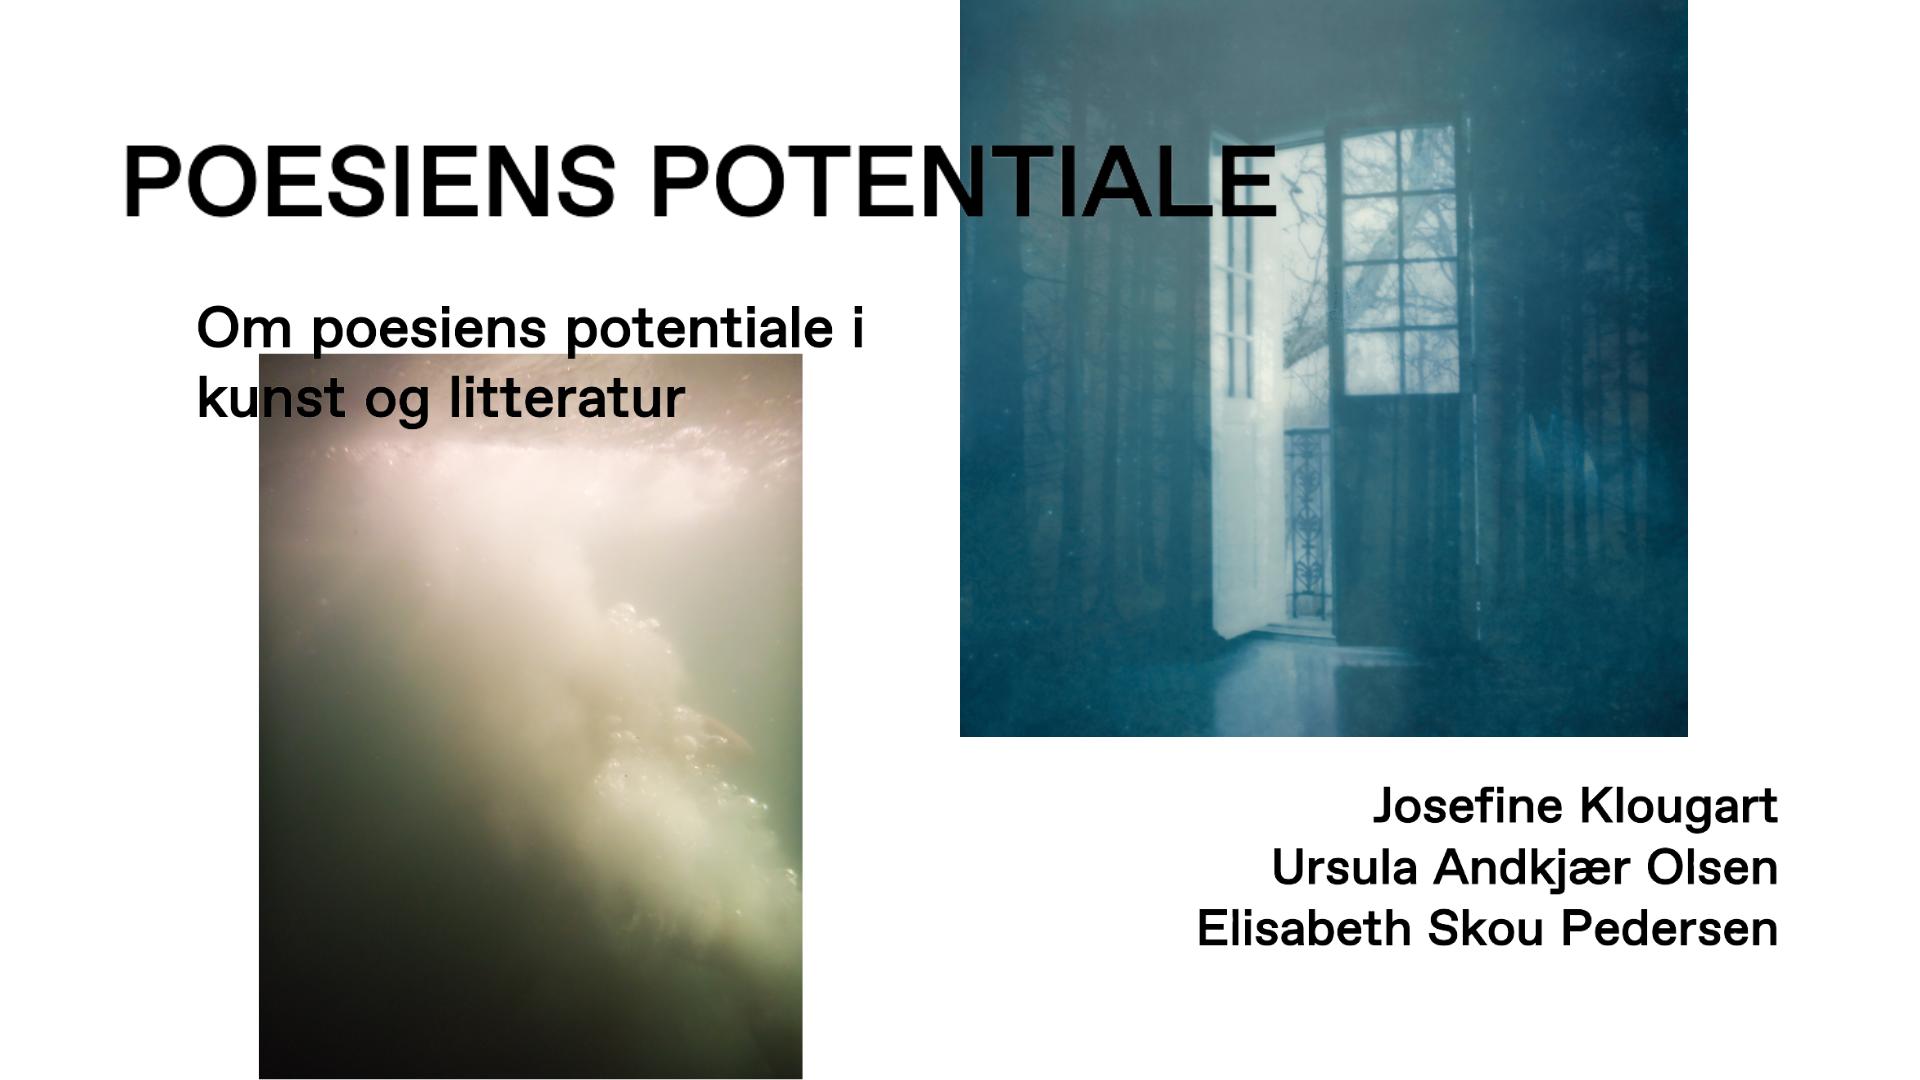 Event: Poesiens potentiale